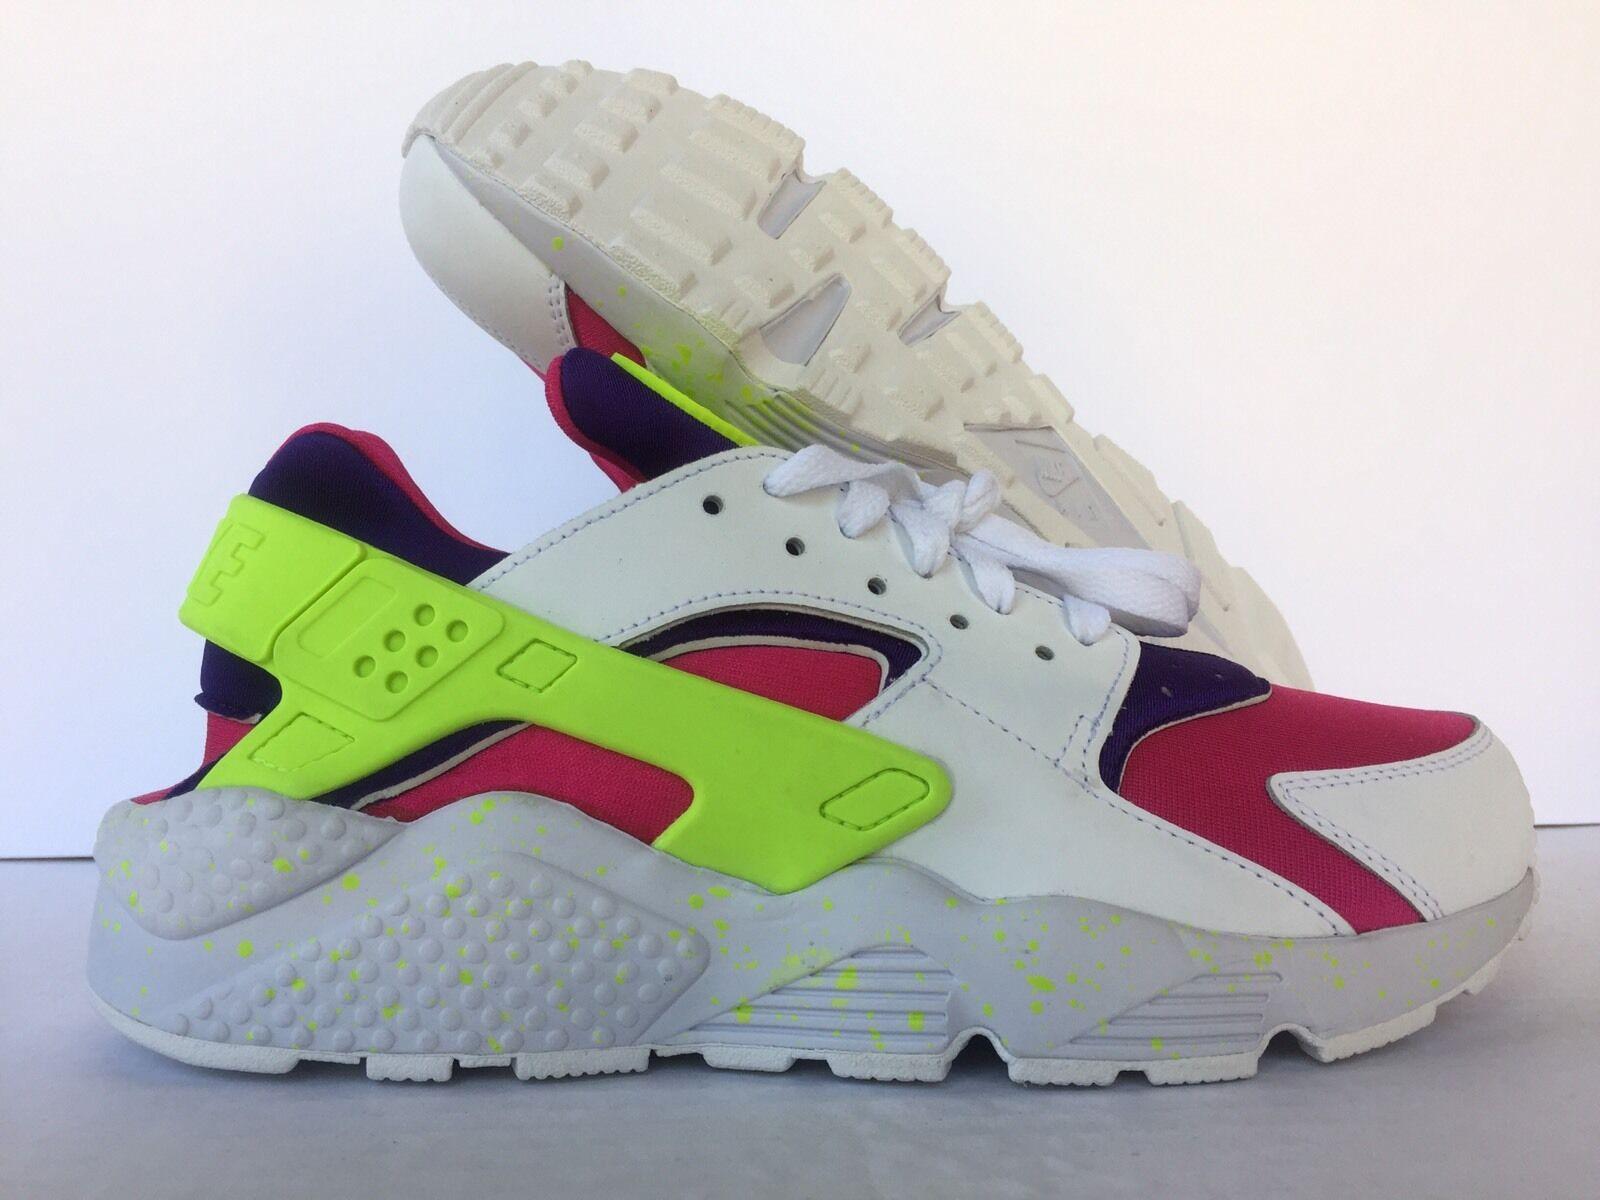 NIKE Uomo bianca/ AIR HUARACHE Nike iD bianca/ Uomo verde-Pink-Purple [777330-972] SZ US Uomo 9 75e6b8